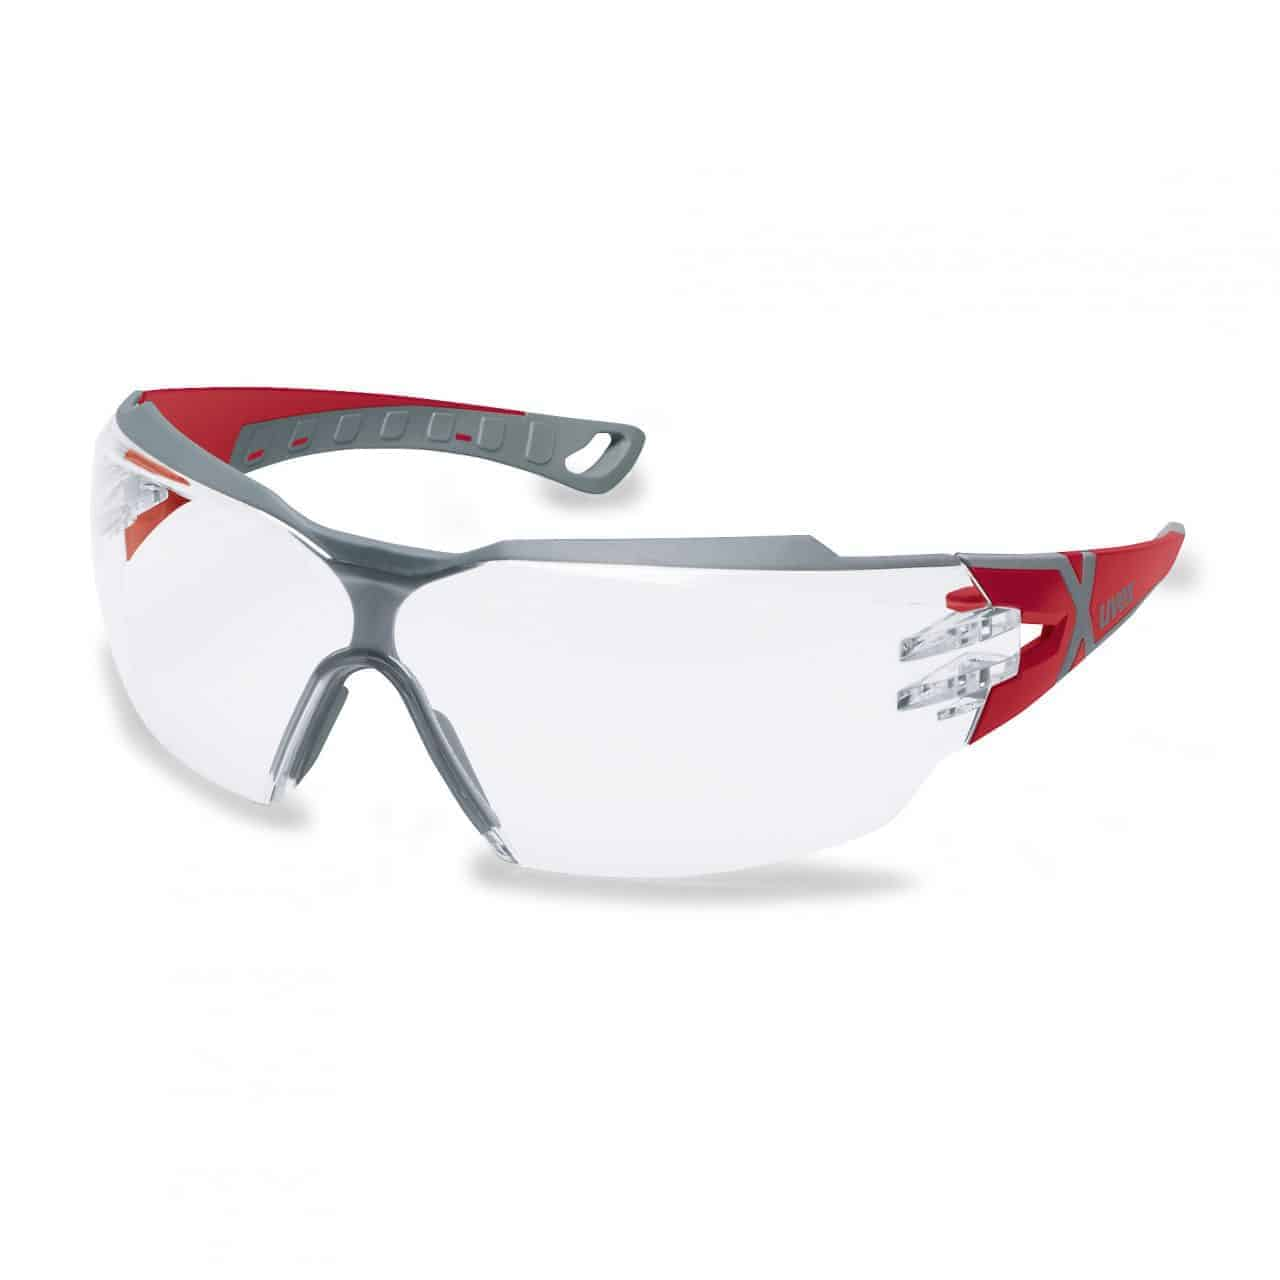 uvex pheos cx2 spectacles